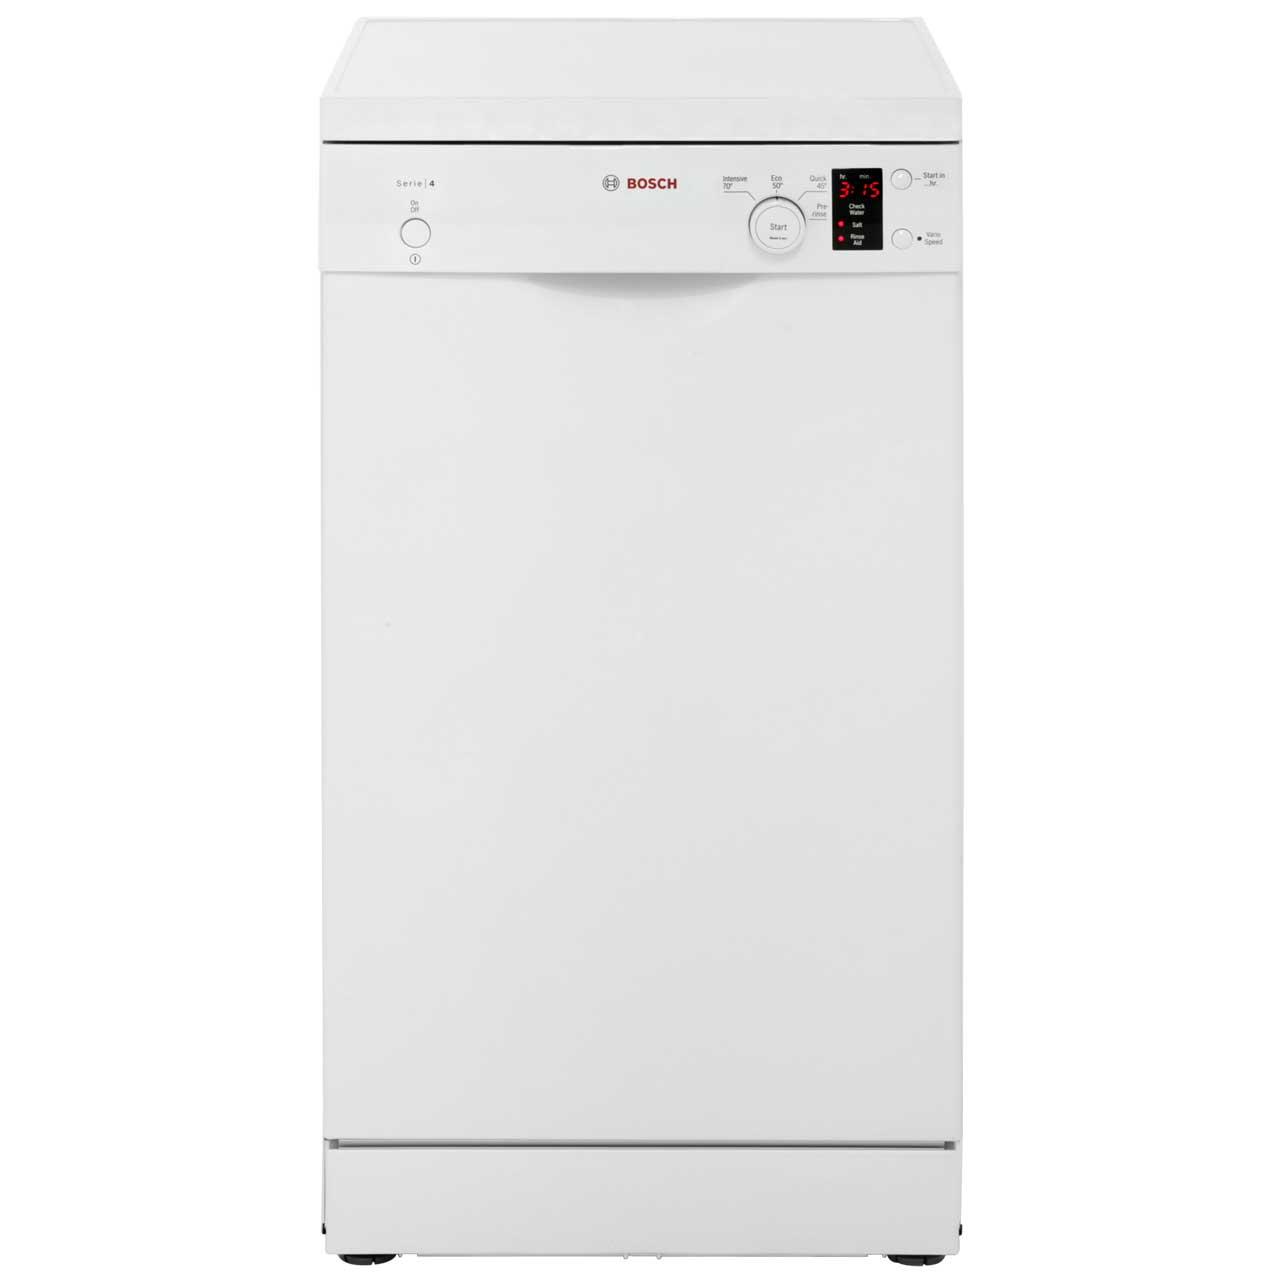 Bosch Serie 4 SPS40E12GB Free Standing Slimline Dishwasher in White